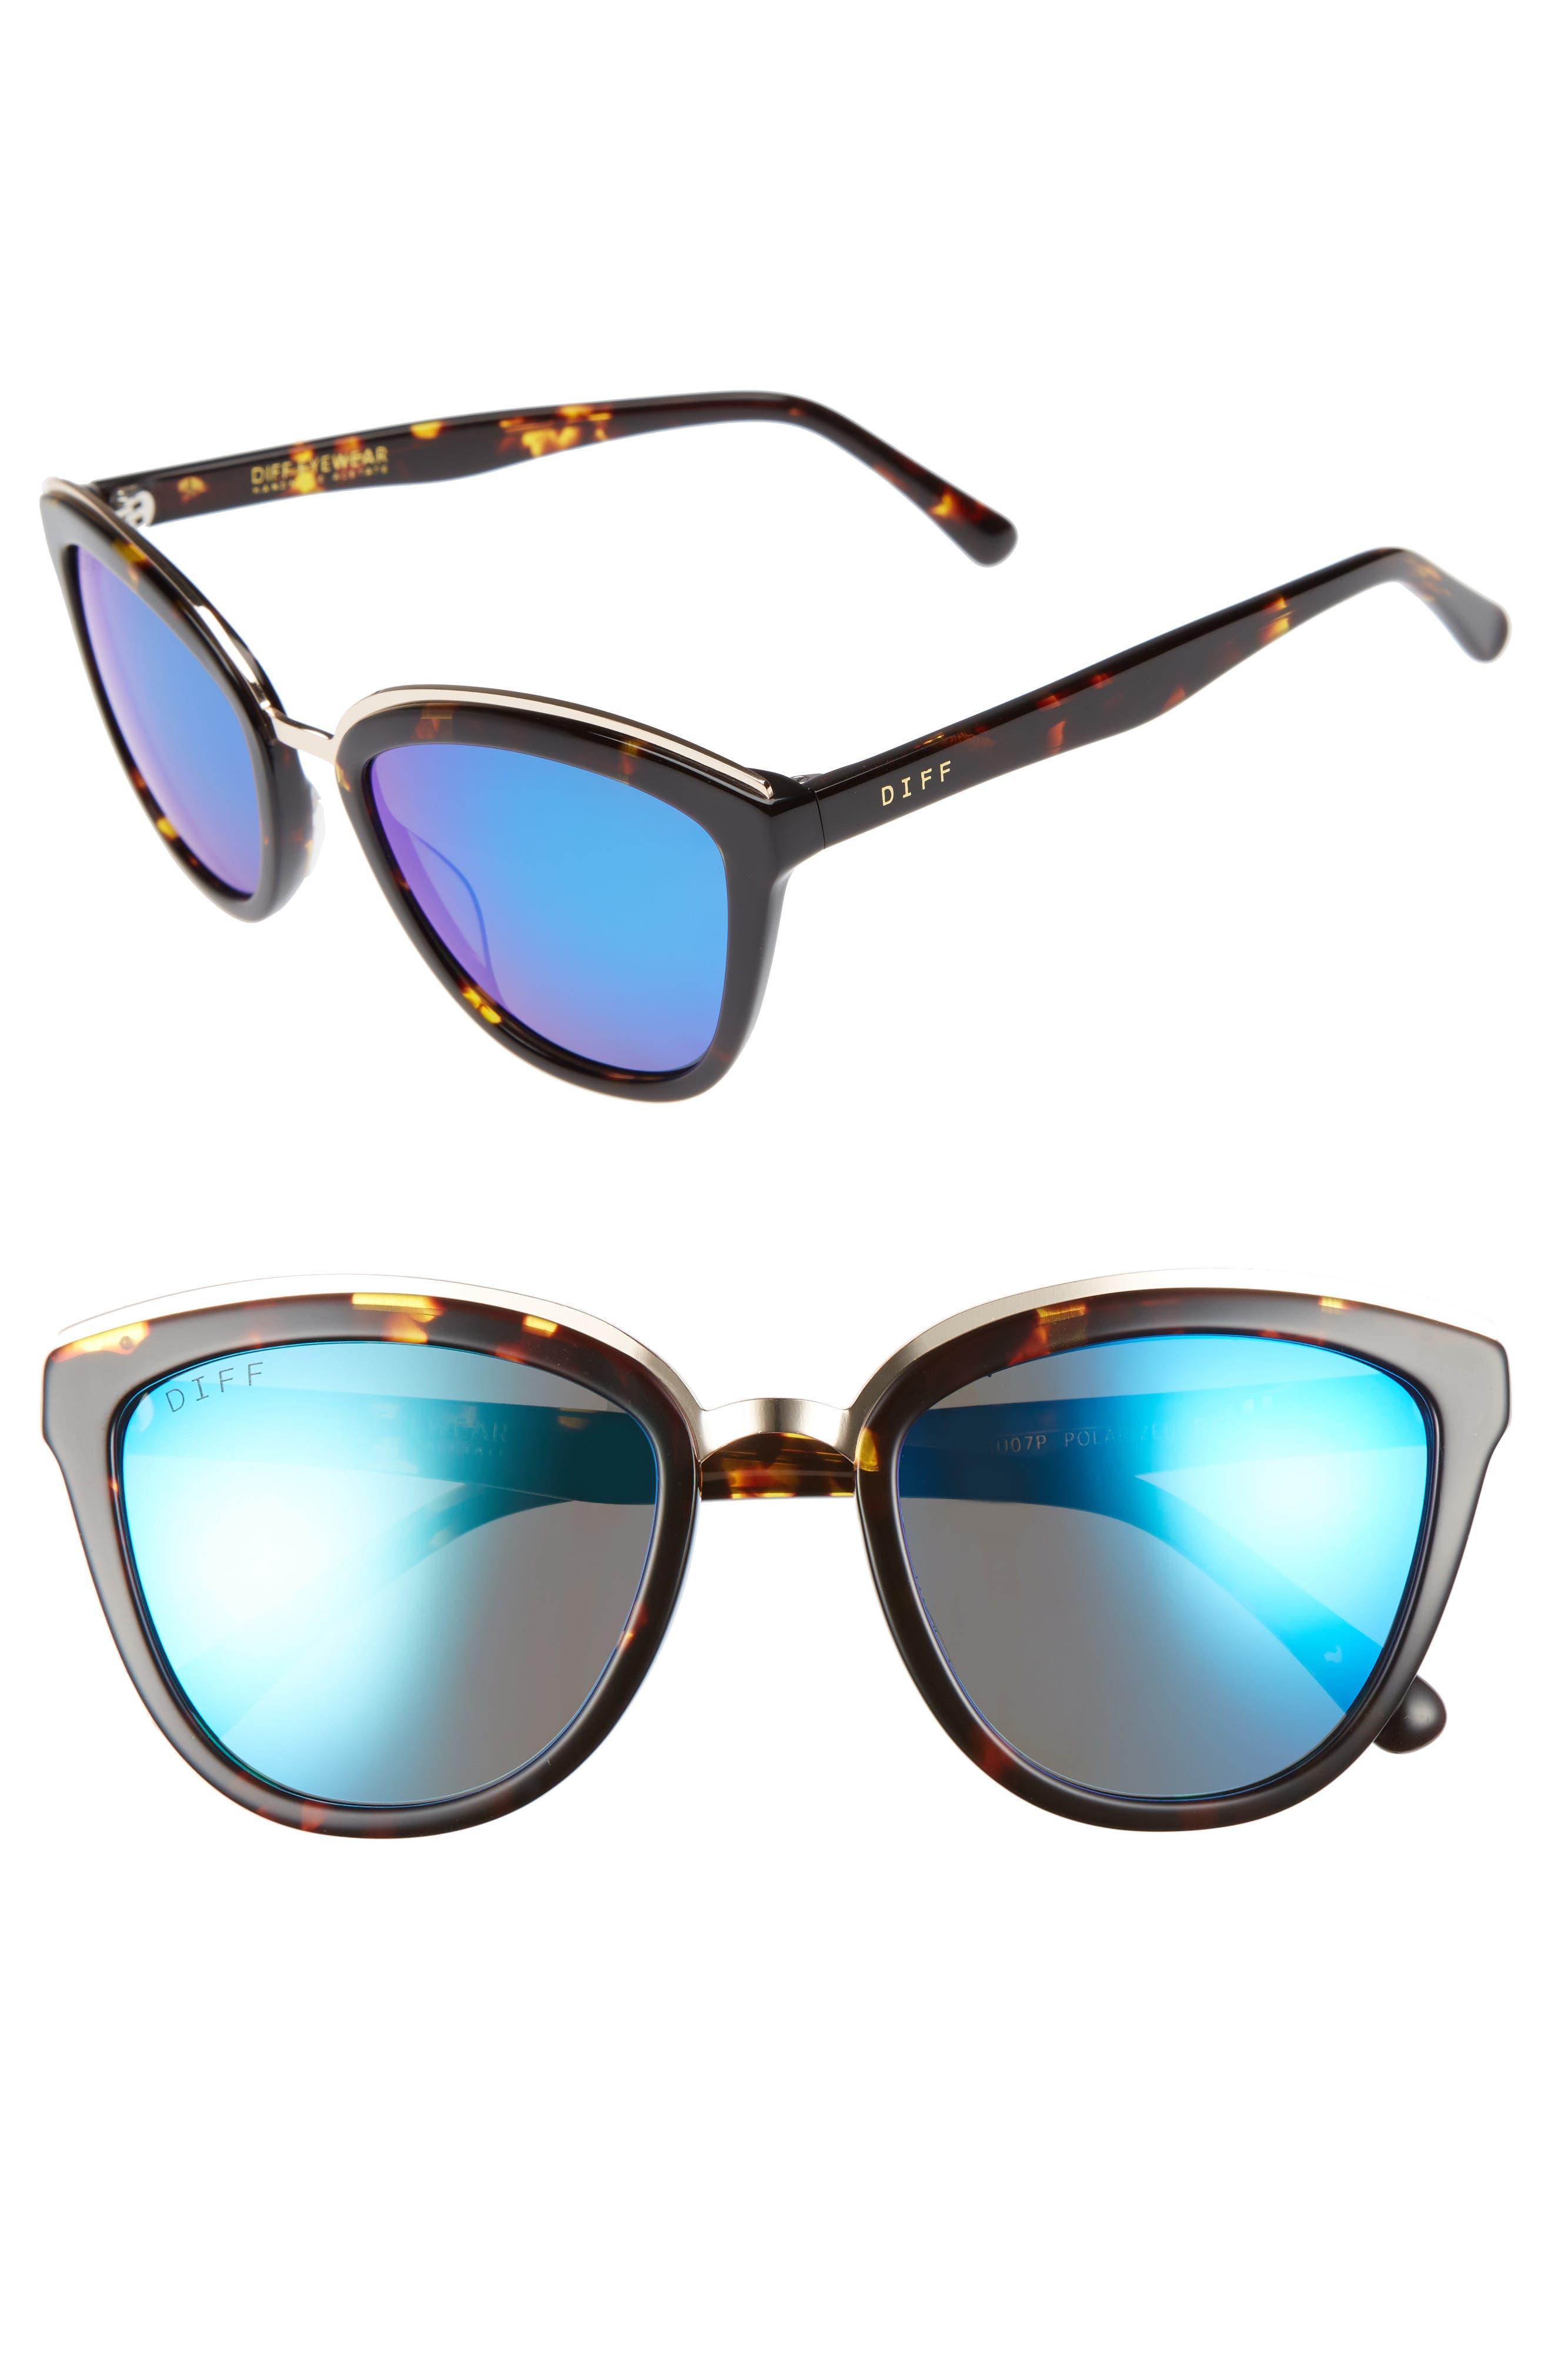 DIFF Rose 55mm Polarized Mirrored Sunglasses